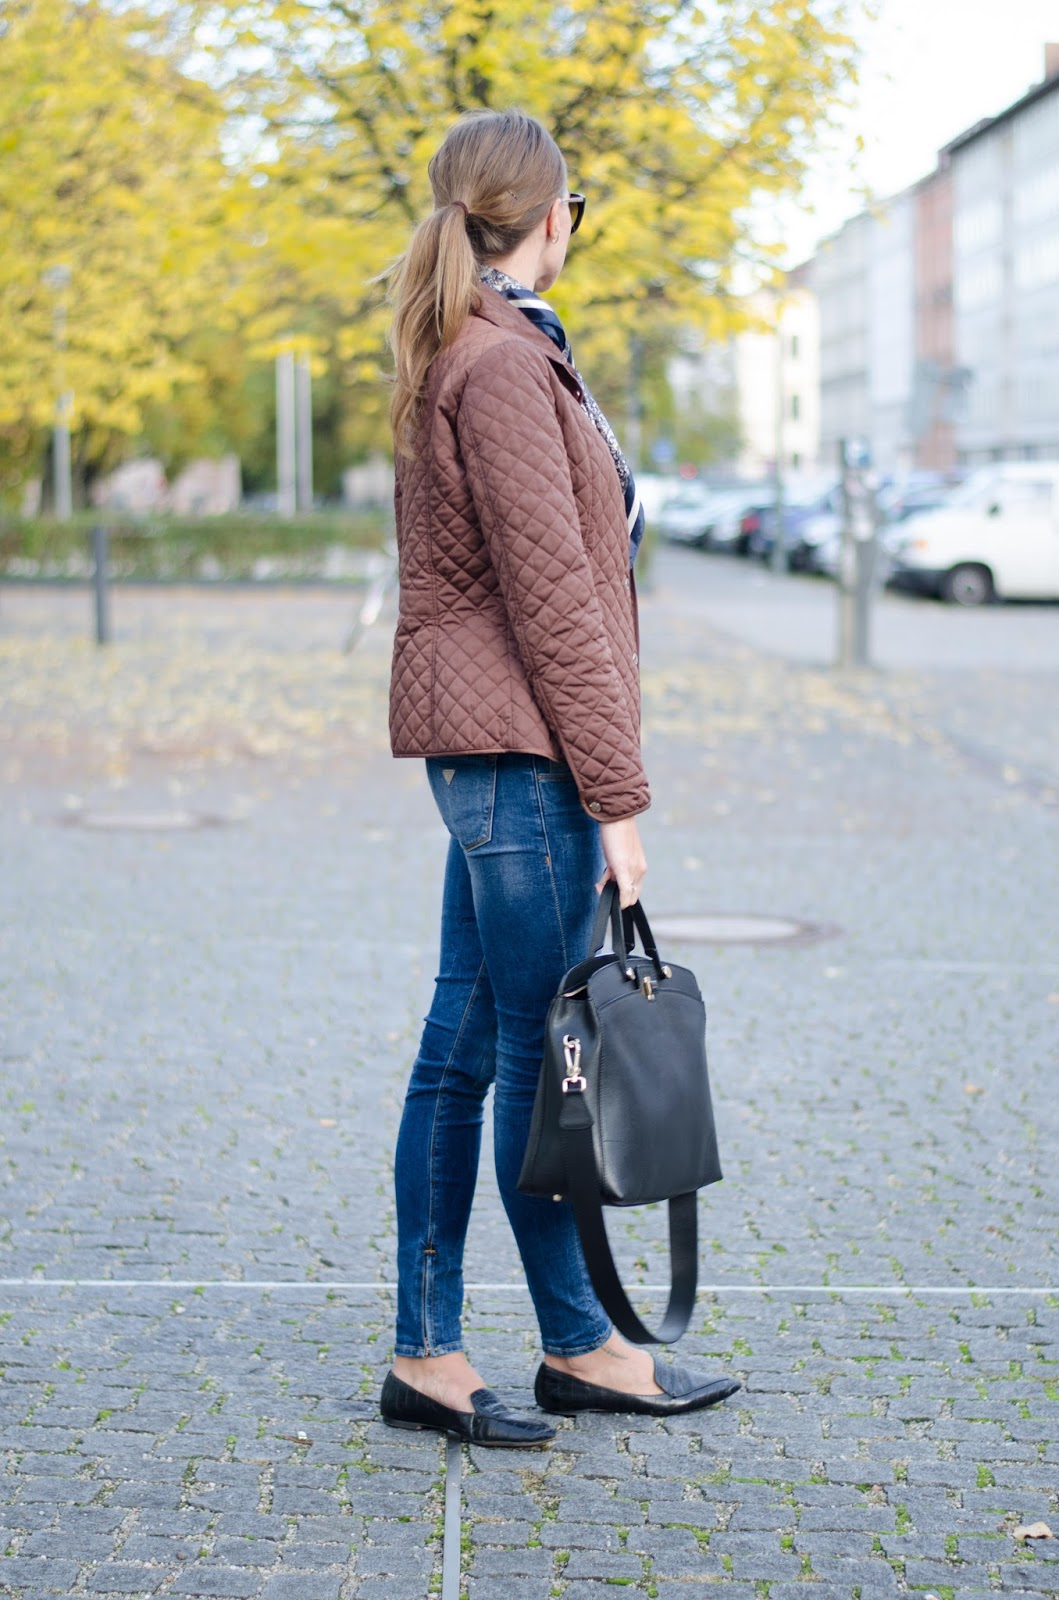 kristjaana mere fall outfit furla bag guess jeans mango flats massimo dutti jacket